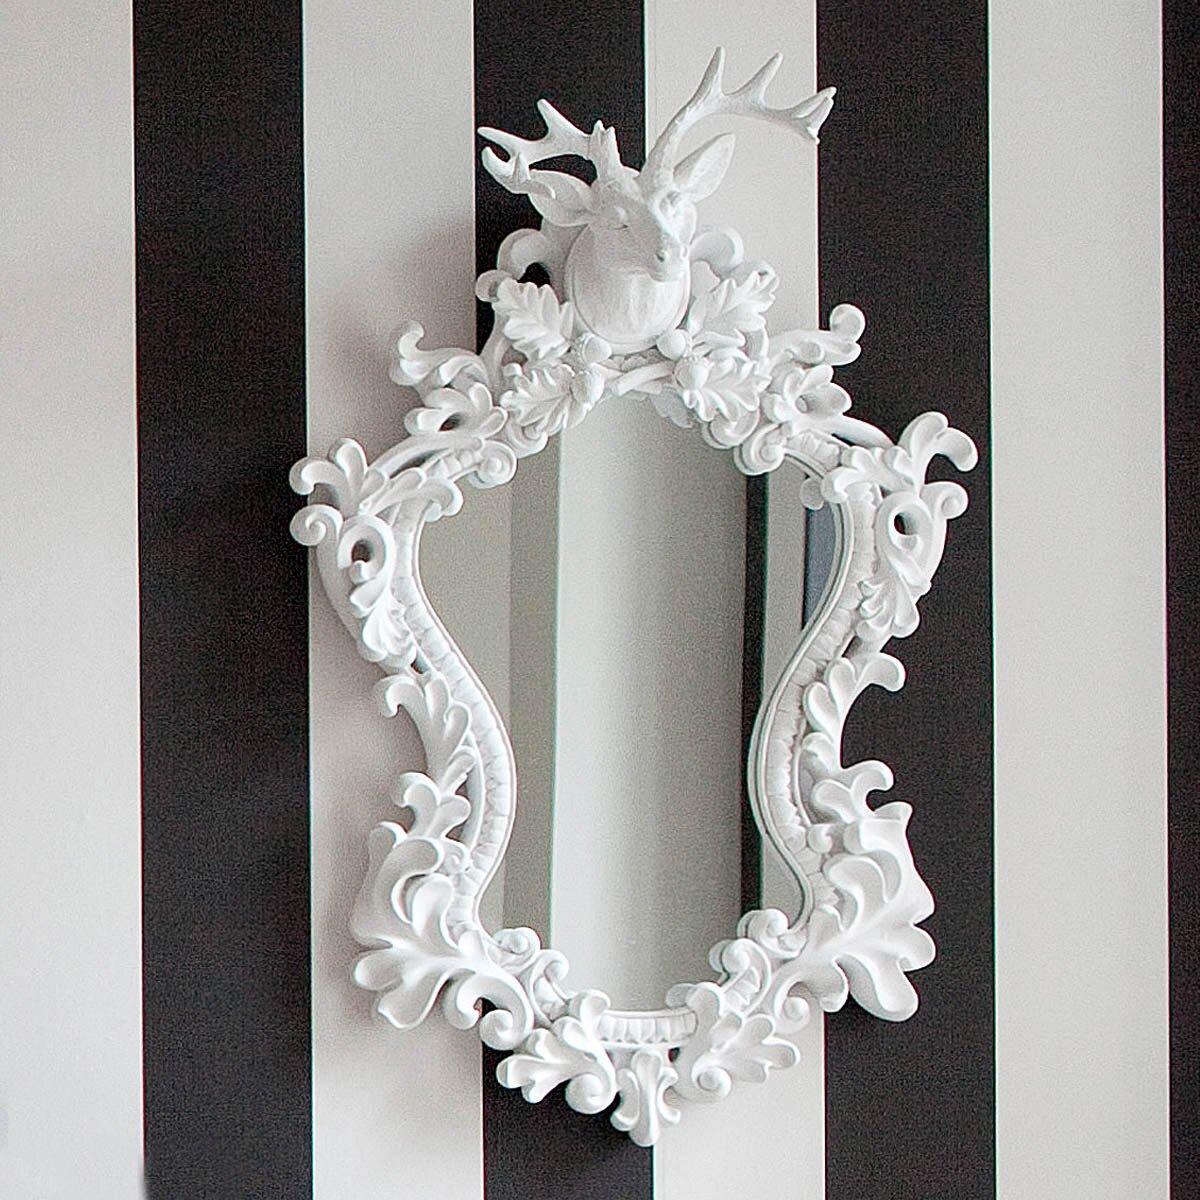 Beautiful Mirror 15 beautiful wall mirror designs | mostbeautifulthings